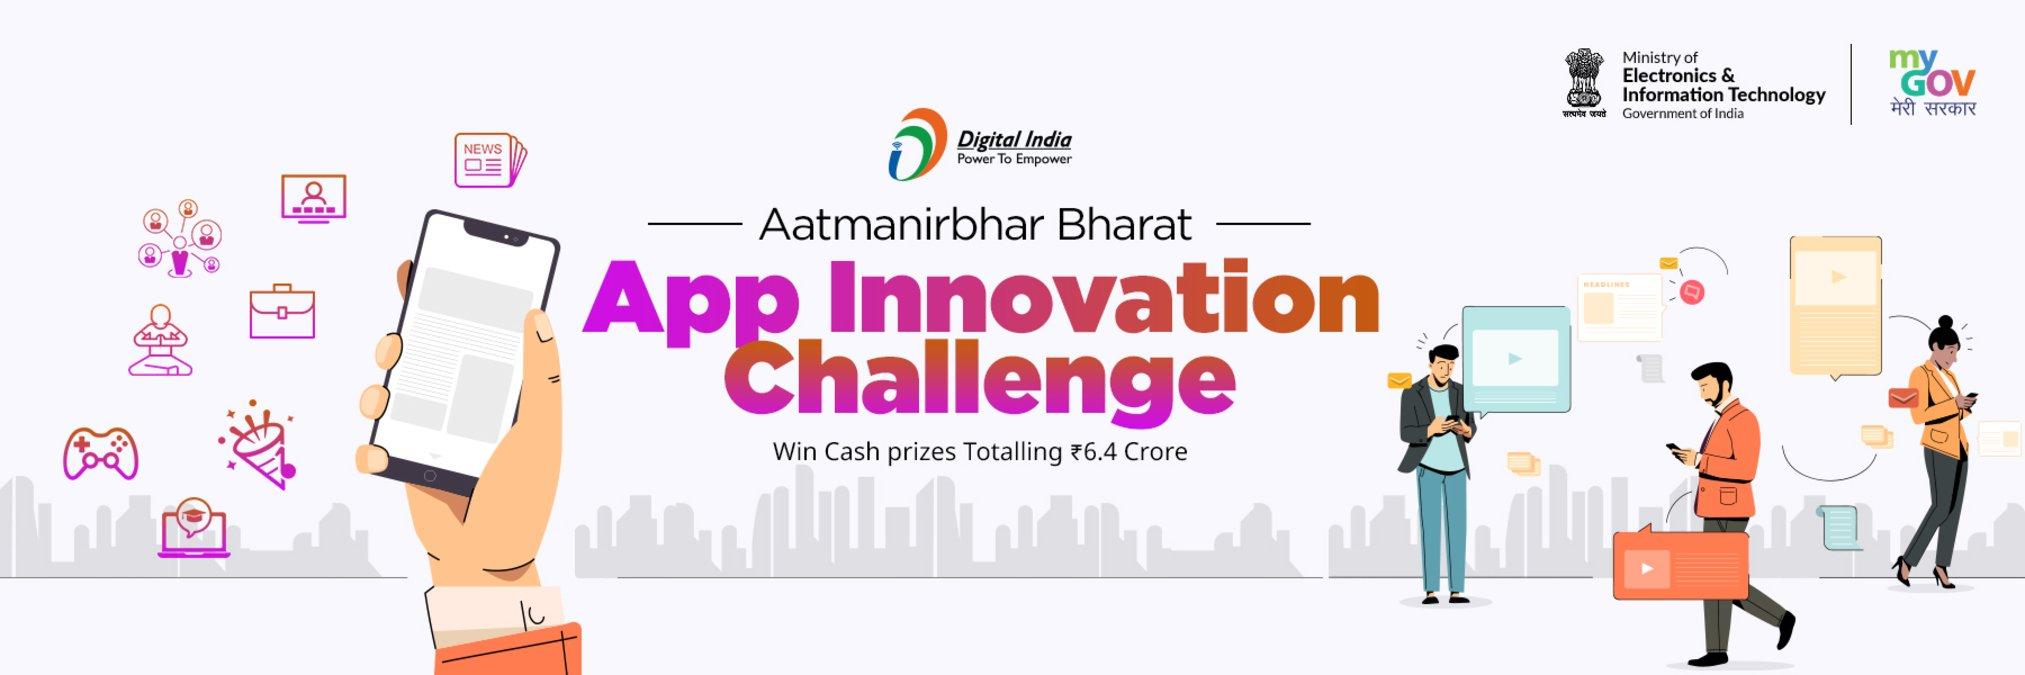 Aatmanirbhar Bharat App Innovation Challenge